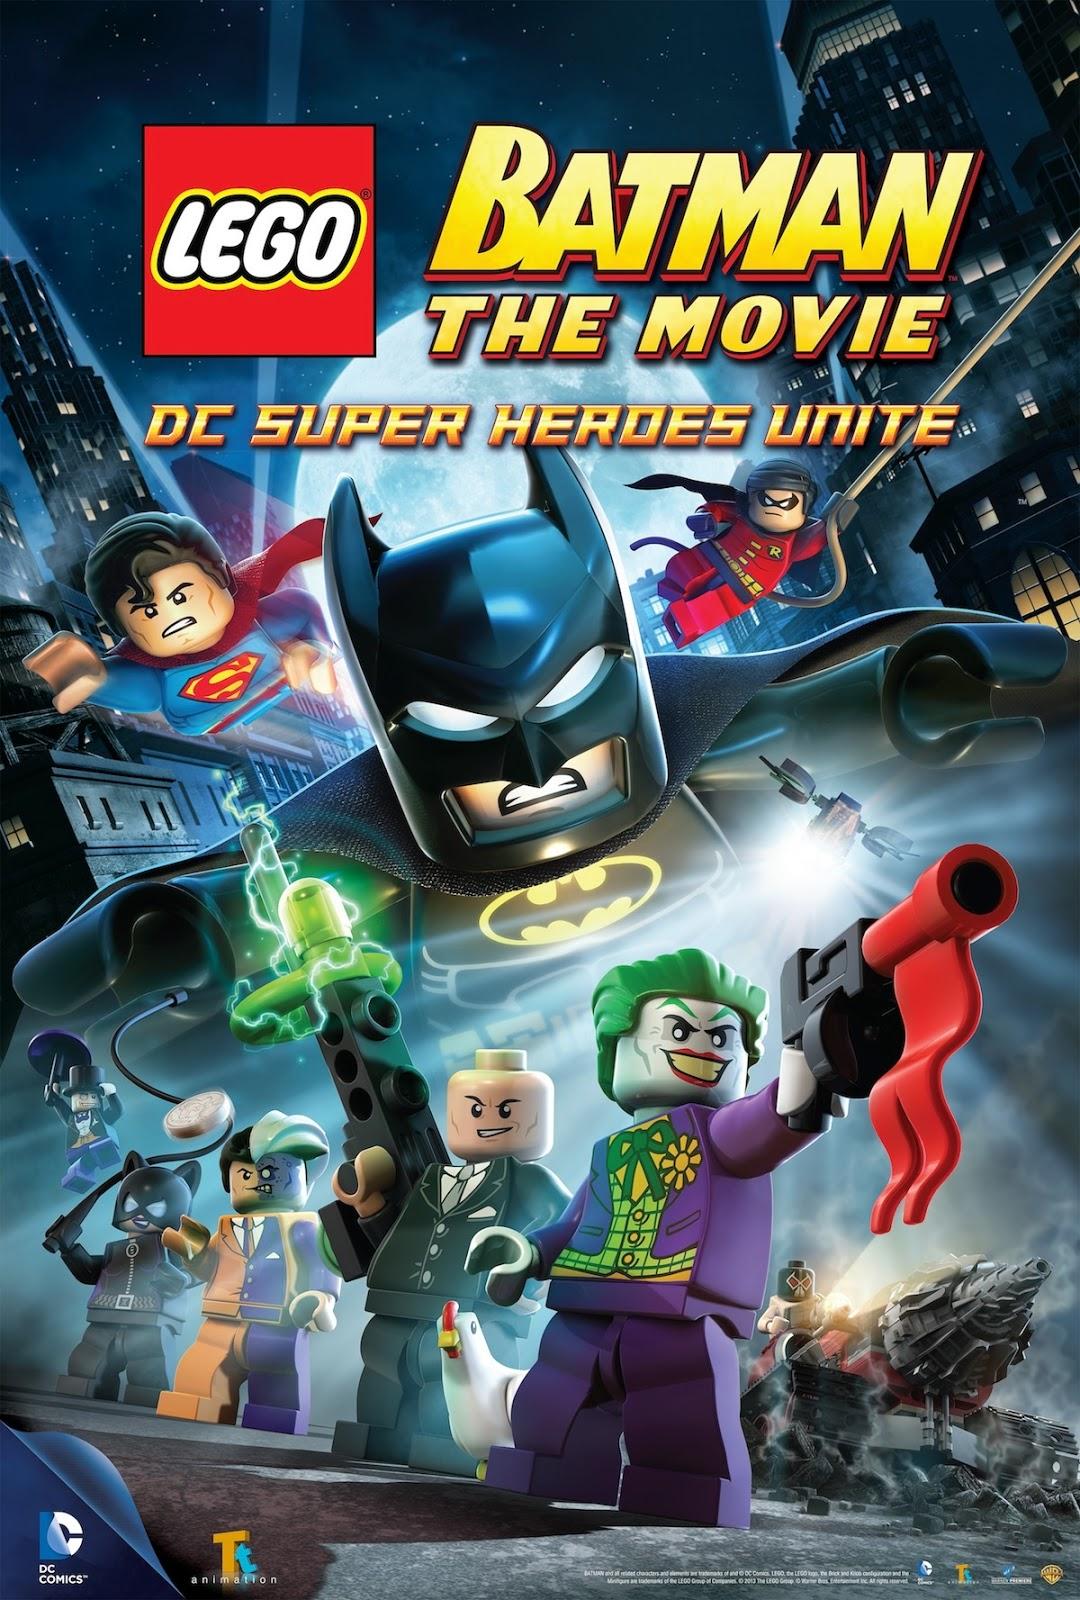 6 Malvorlagen Lego Superheroes: Héroes Animados: LEGO Batman: DC Super Heroes Unite